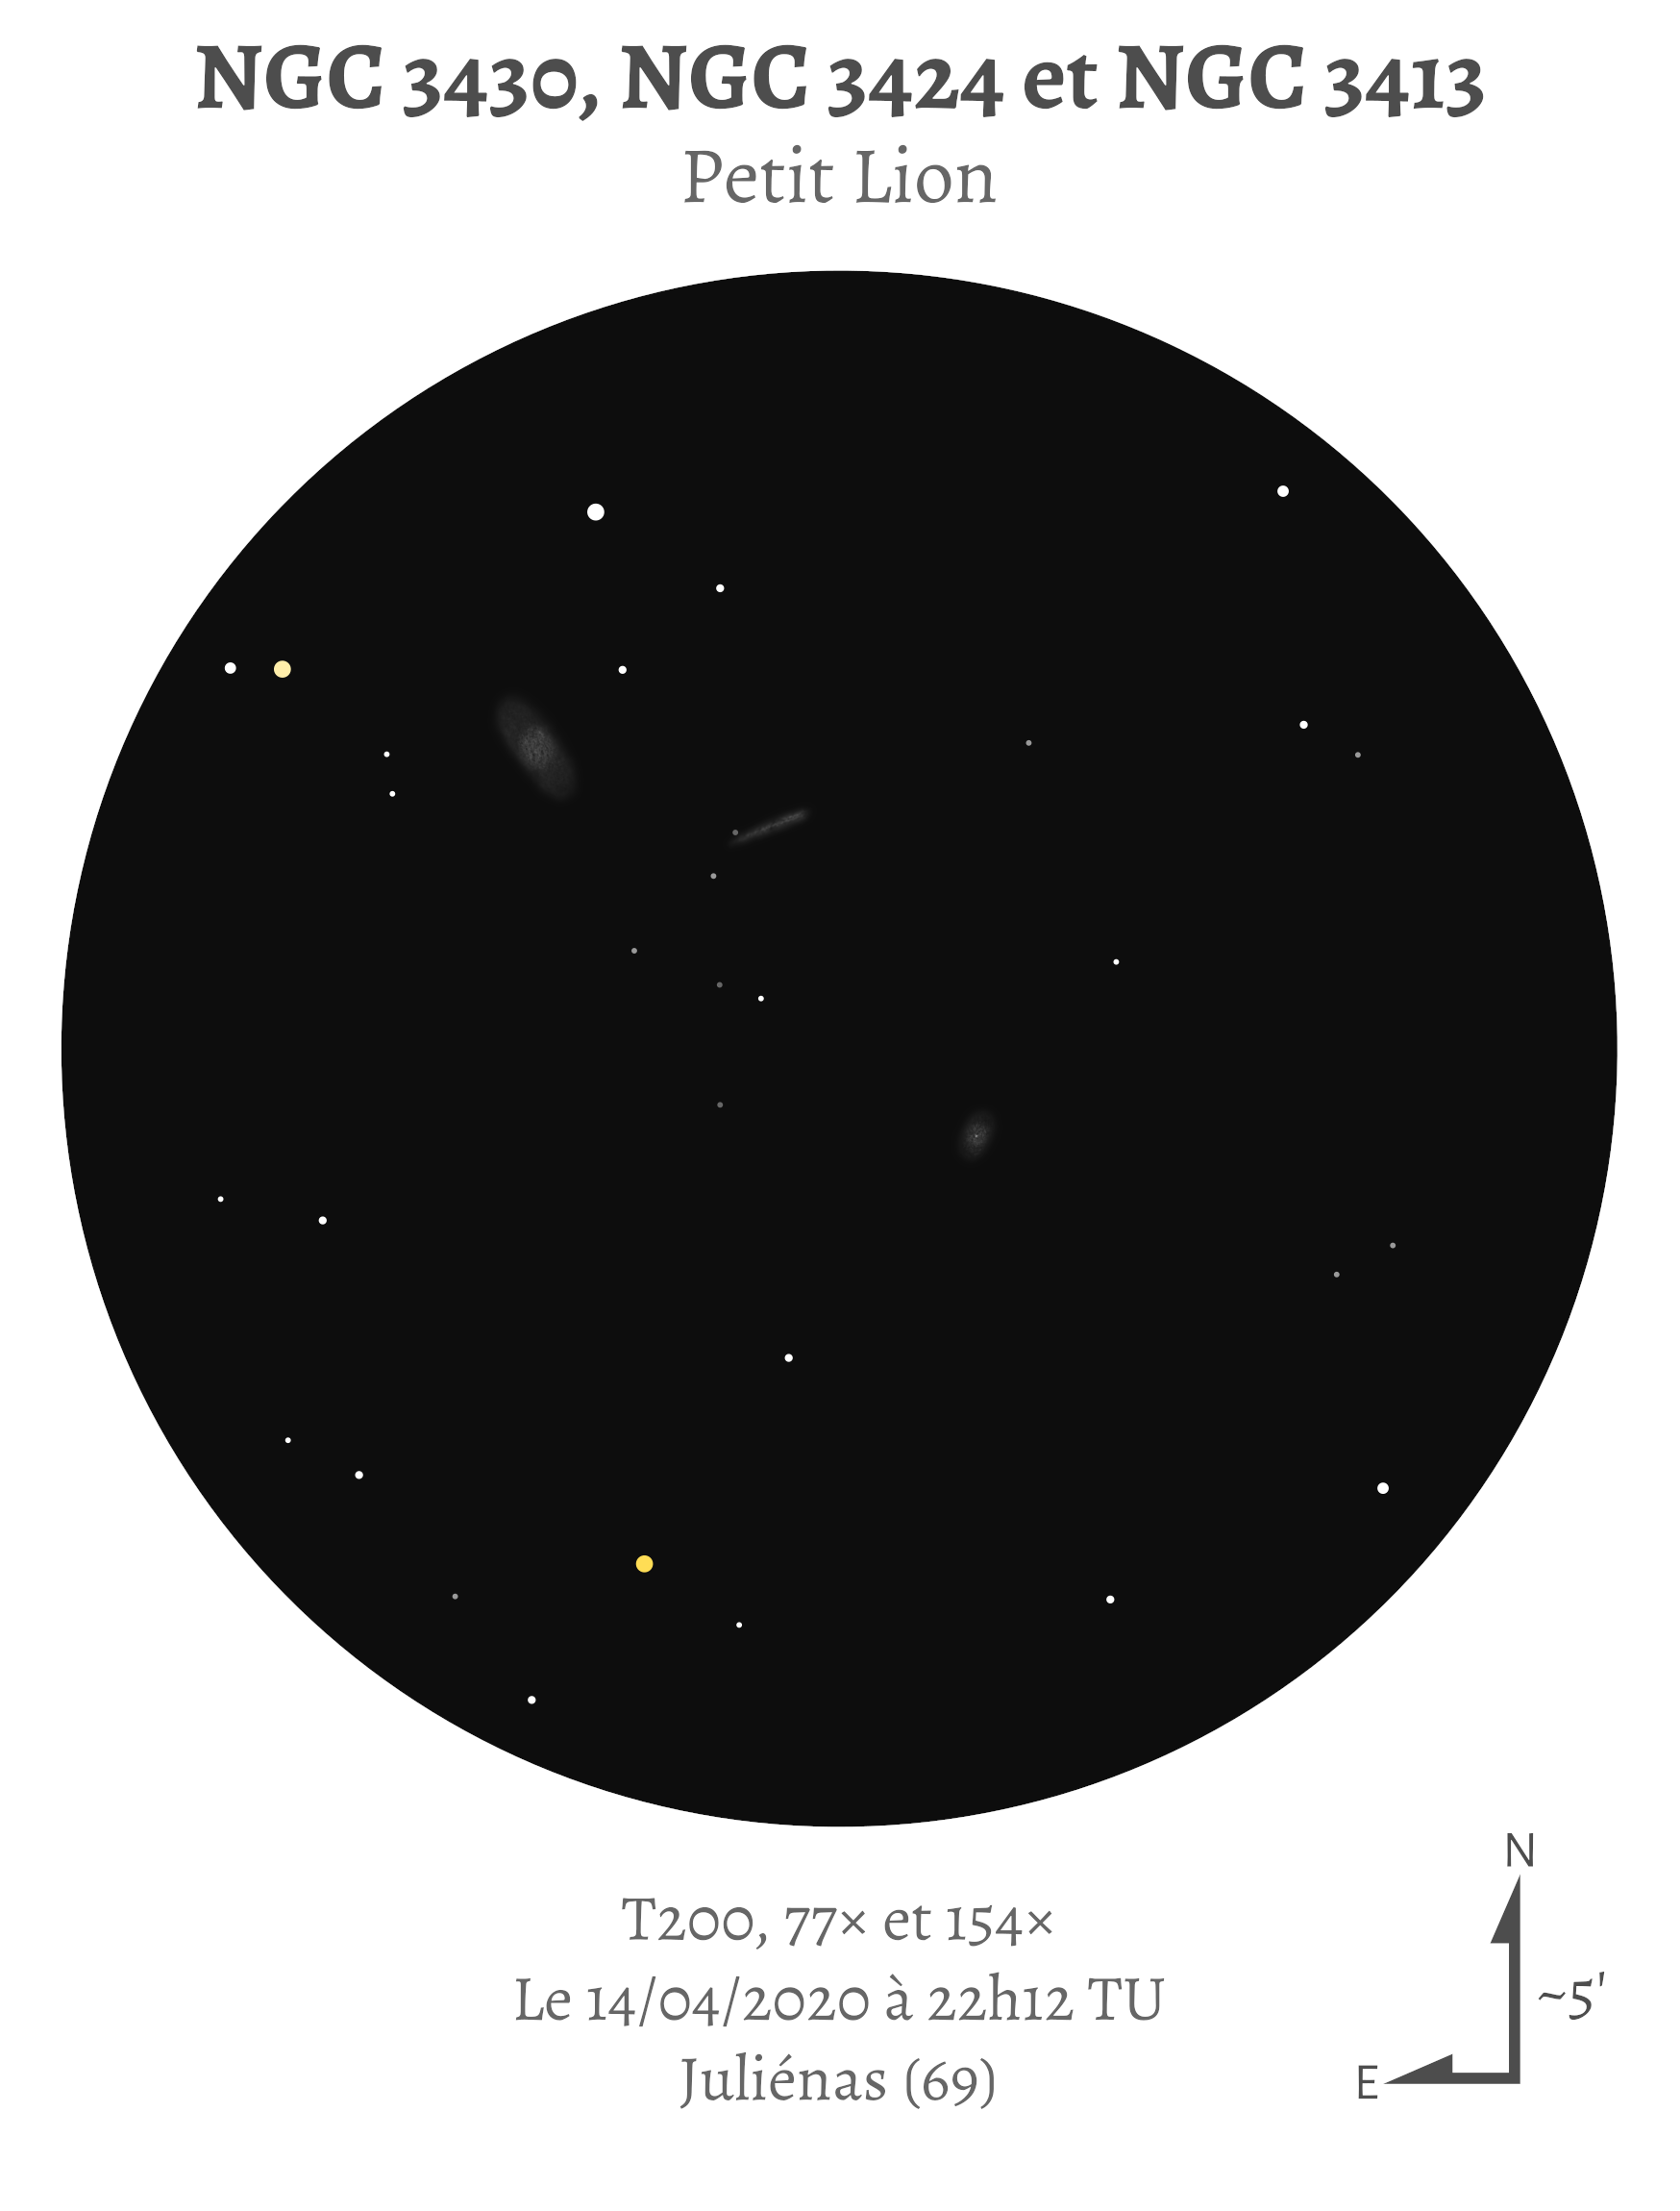 NGC 3430, NGC 3424 et NGC 3413 au T200